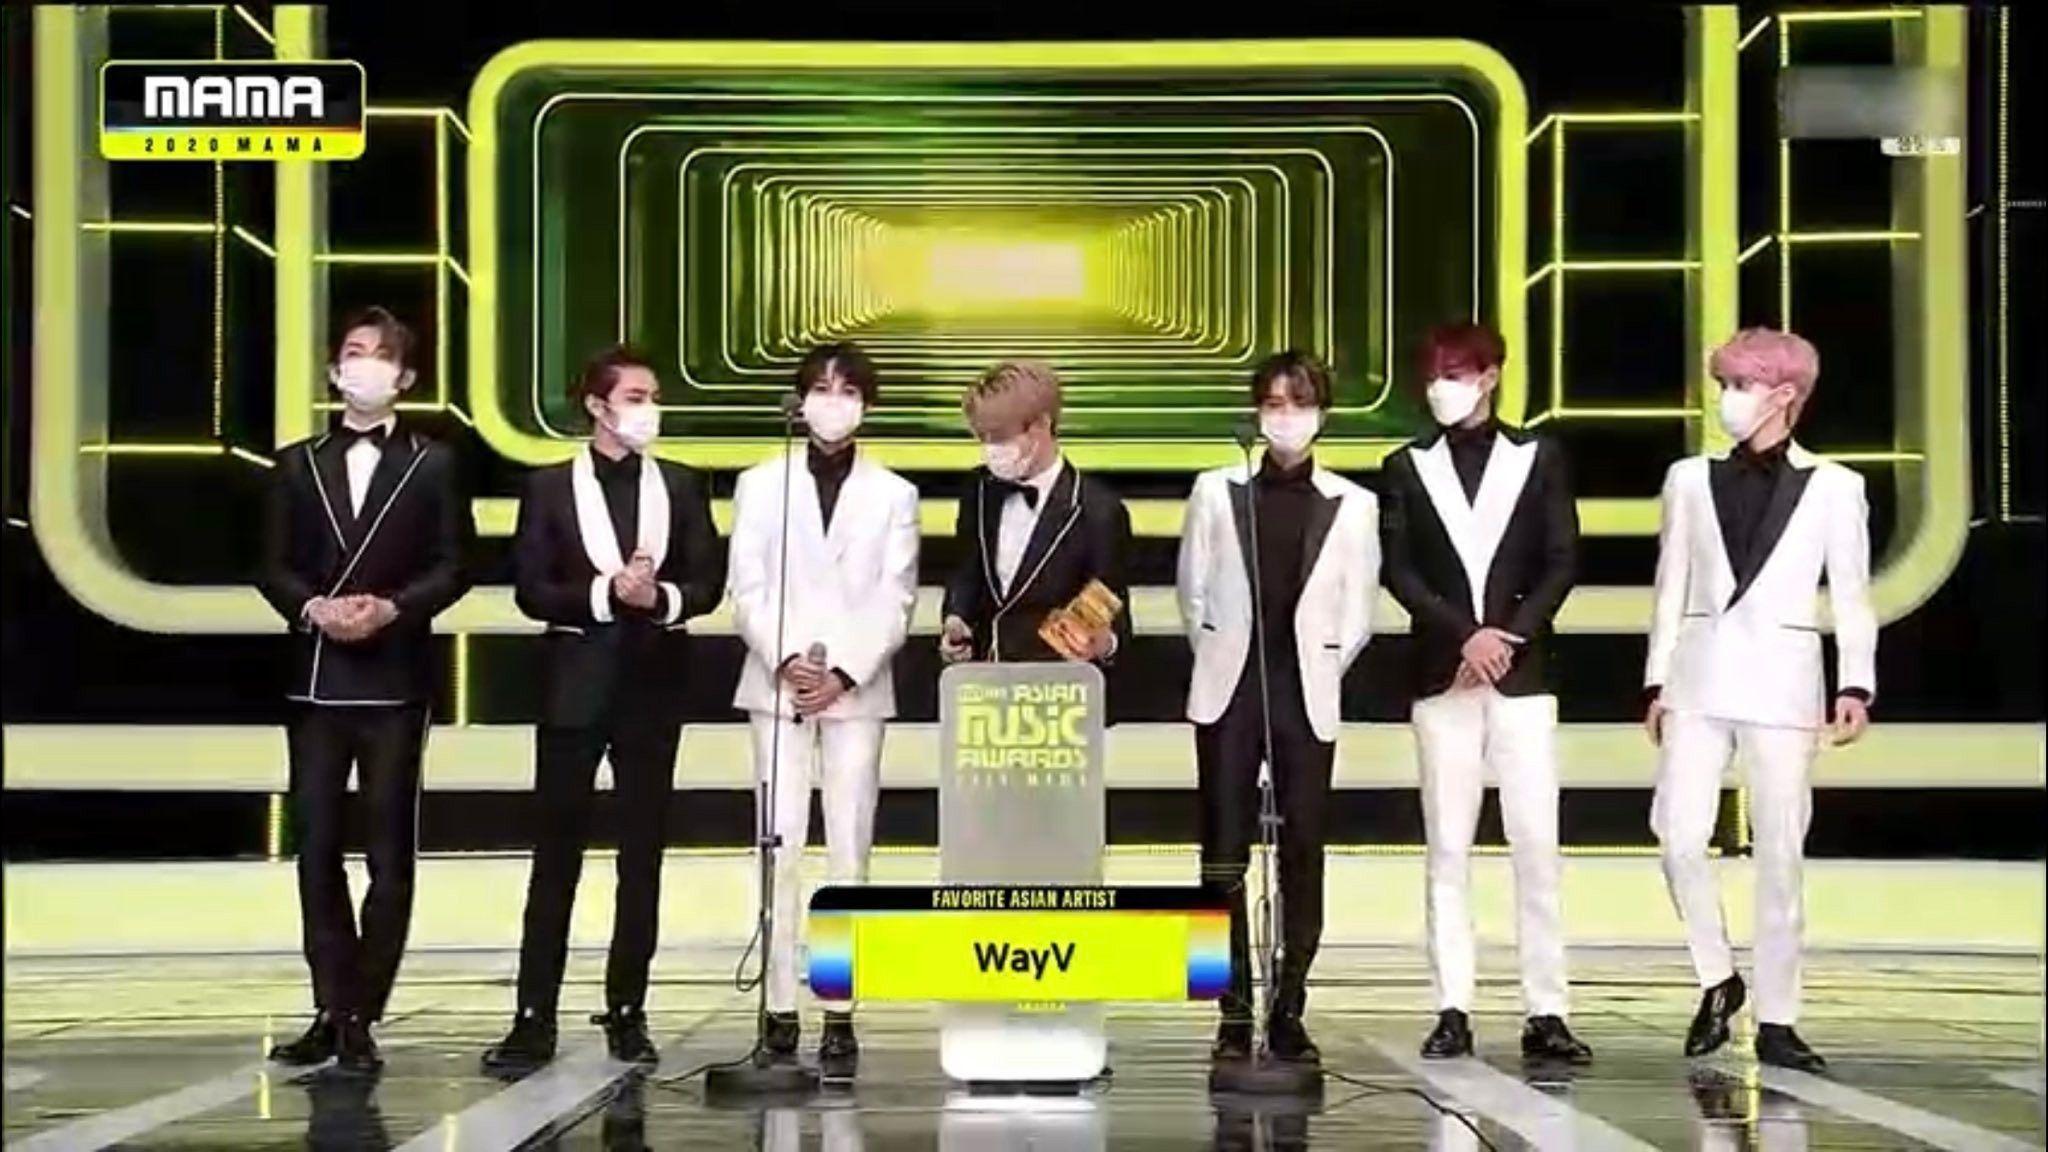 Wayv Winning The Favorite Asian Artist Award At The 2020 Mnet Asian Music Awards Mama Di 2020